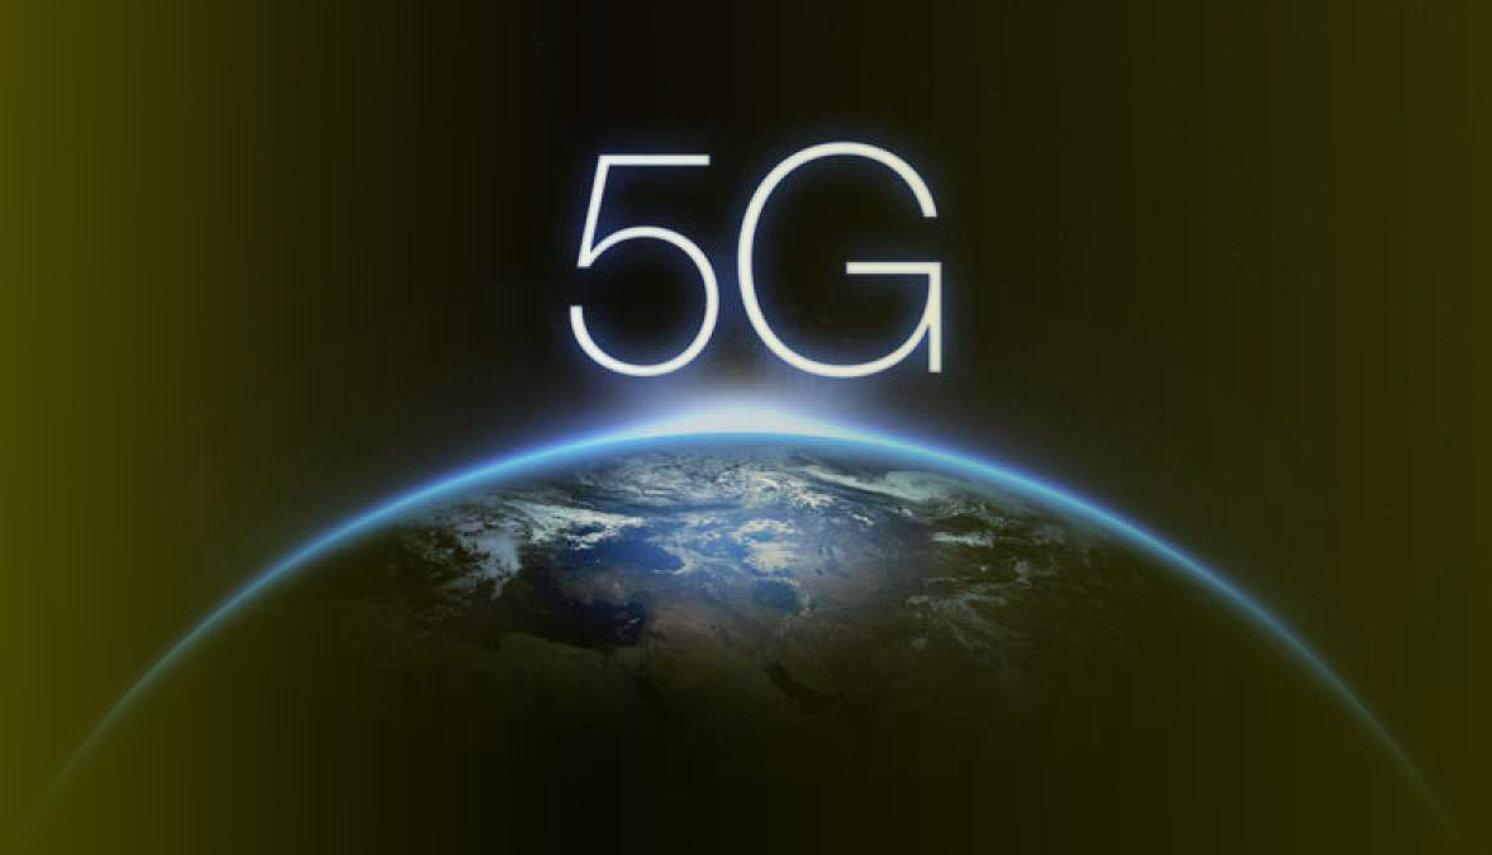 Qué Sectores a nivel mundial se Benefician del 5G